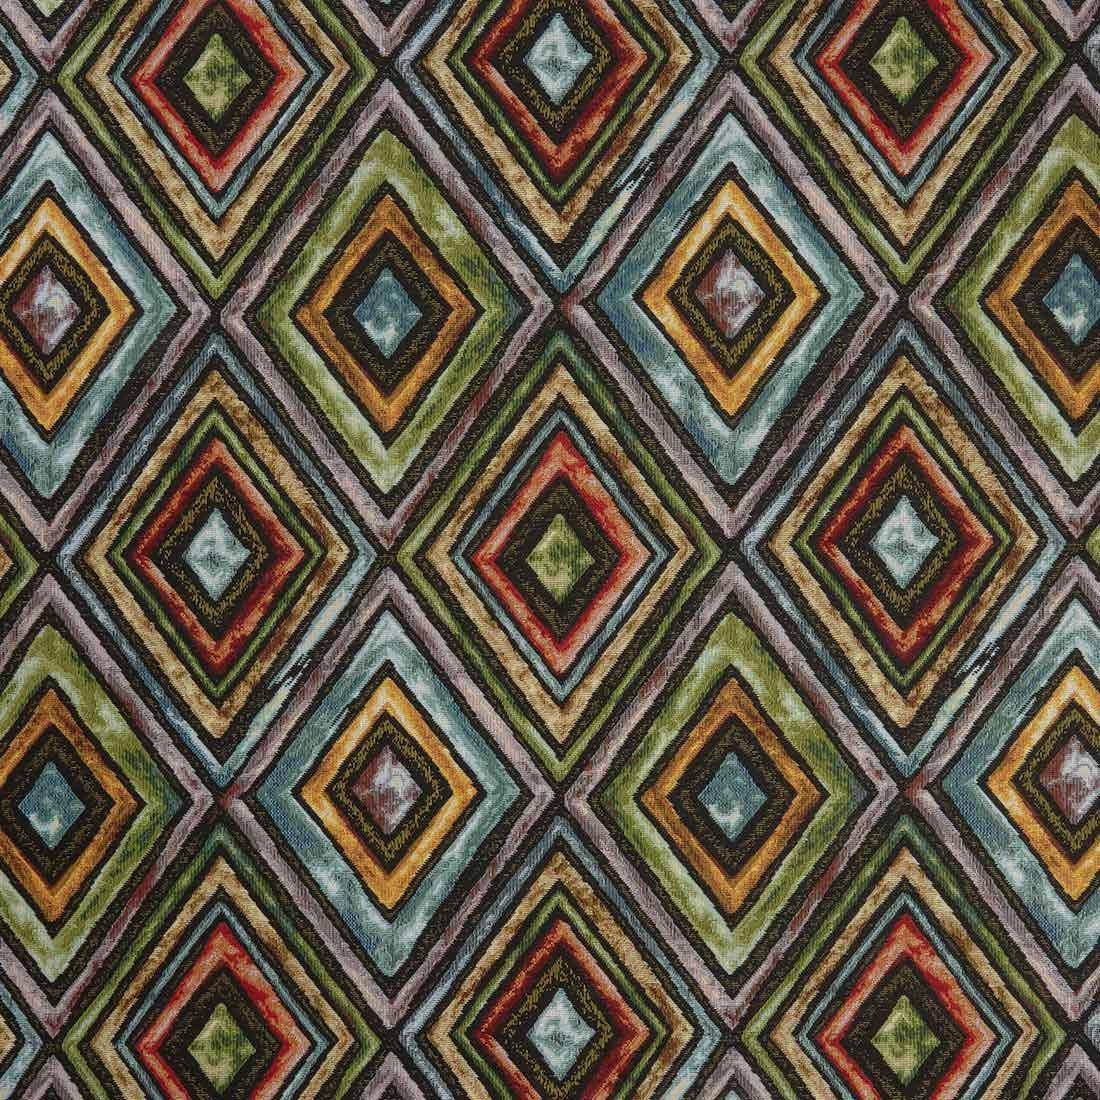 Tulum Leaf Upholstery Fabric